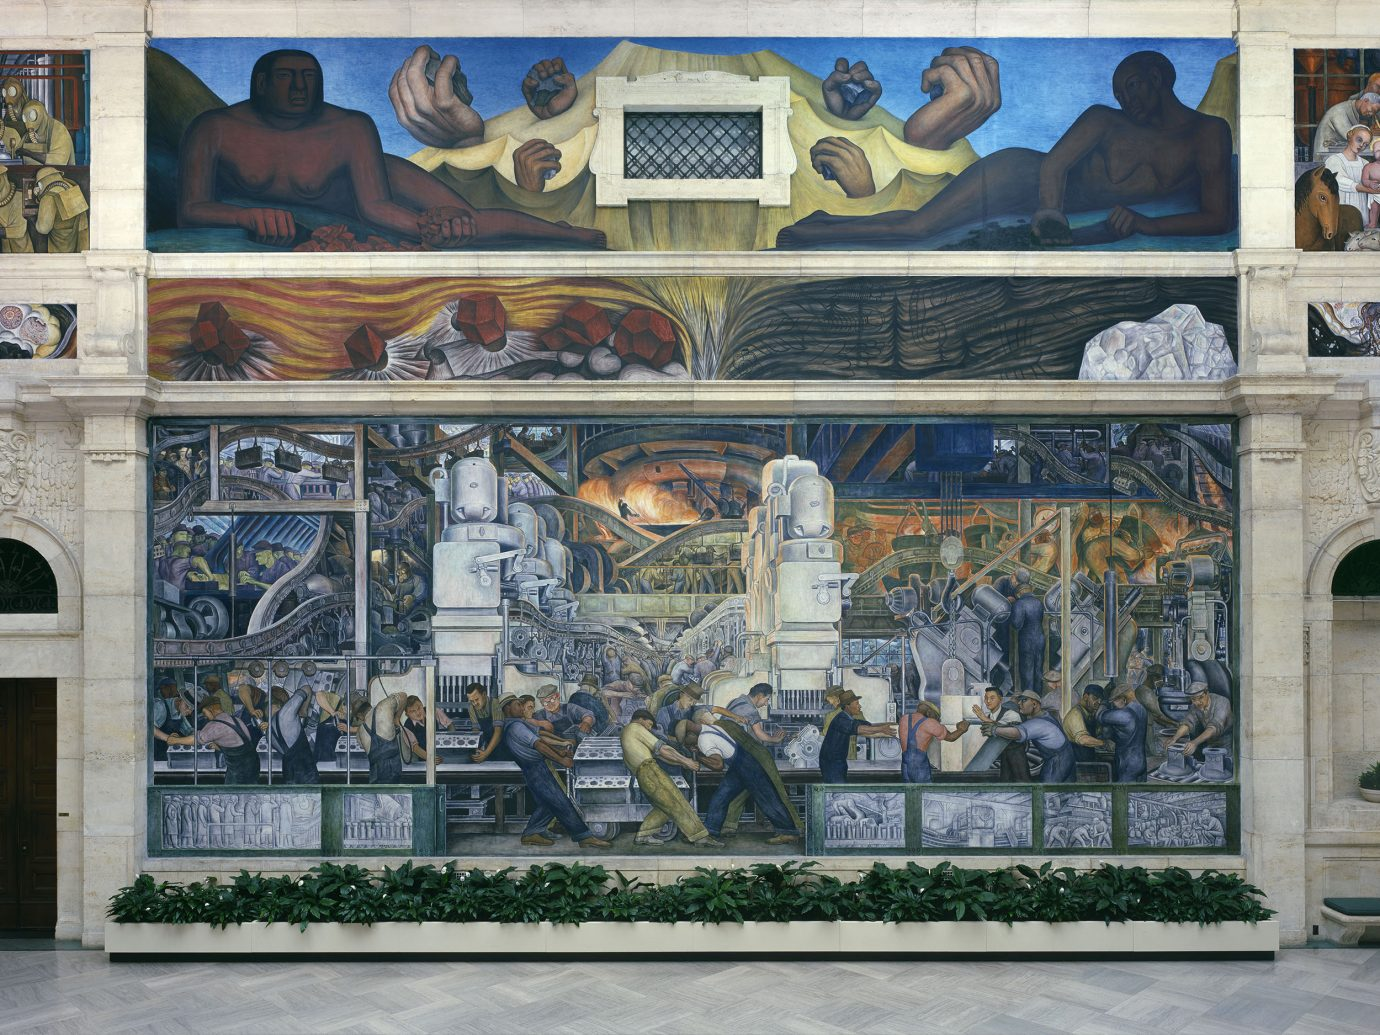 Detroit Influencers + Tastemakers Trip Ideas mural art facade tourist attraction artwork painting window building